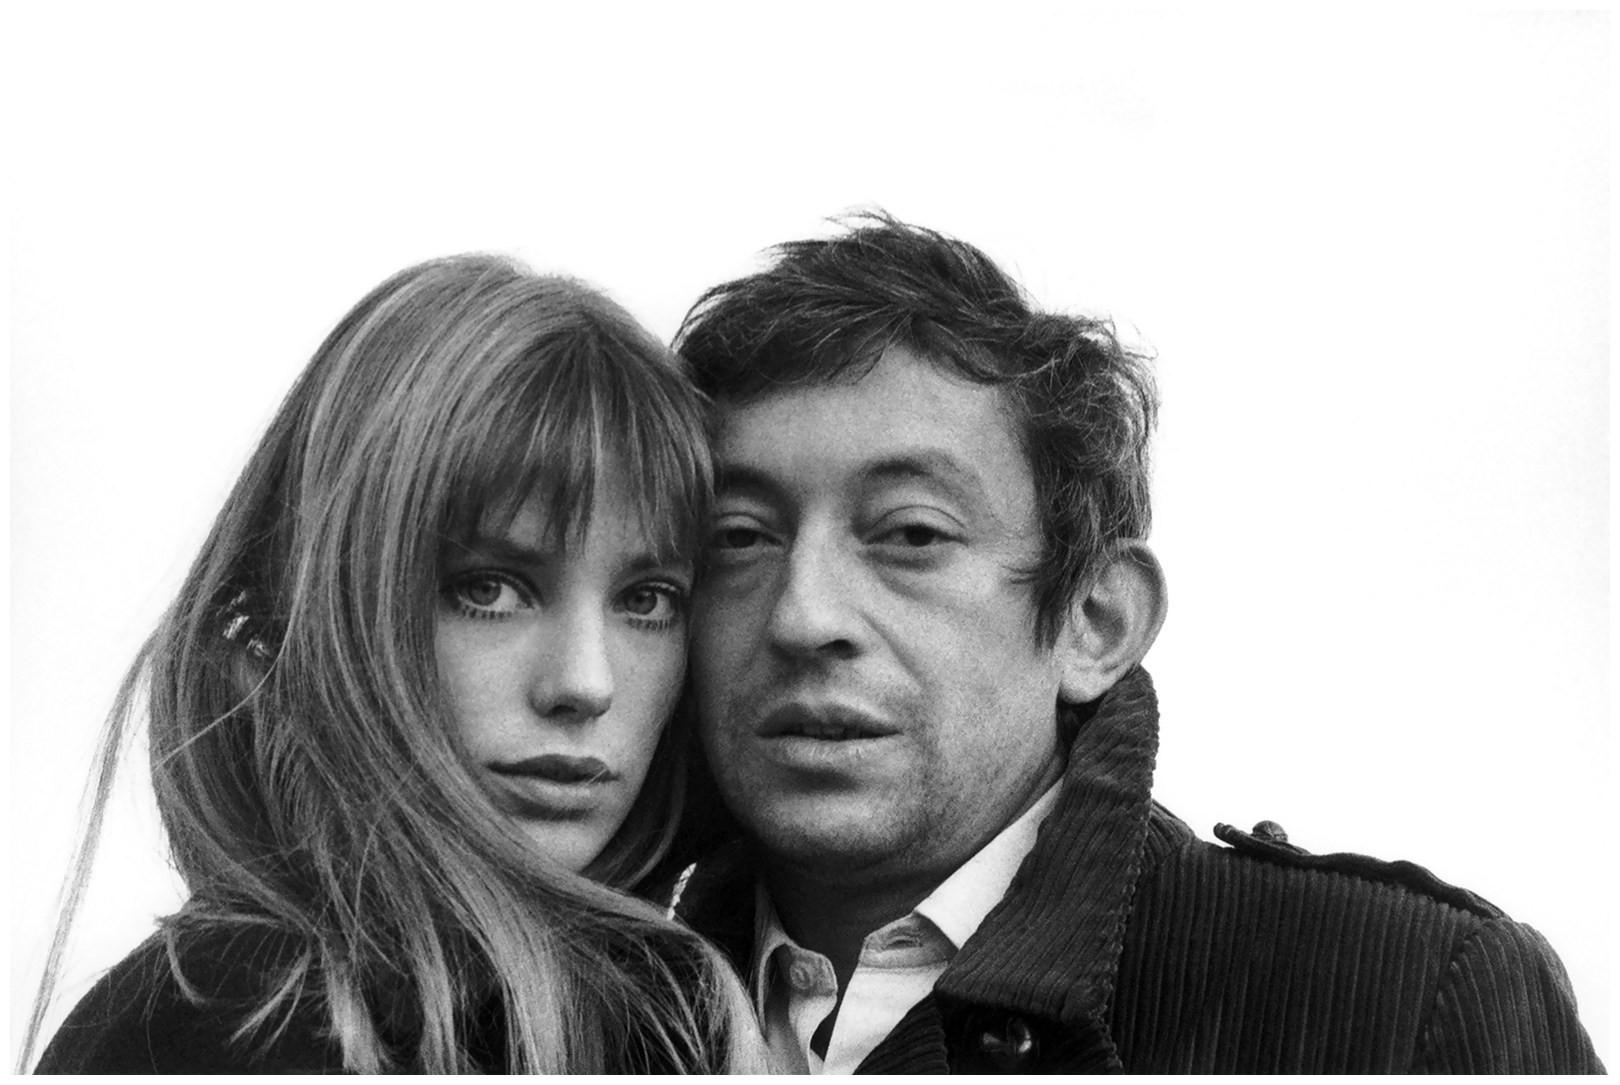 Iconic_Couples_JaneBirkin_SergeGainsbourg_Fabulous_Muses